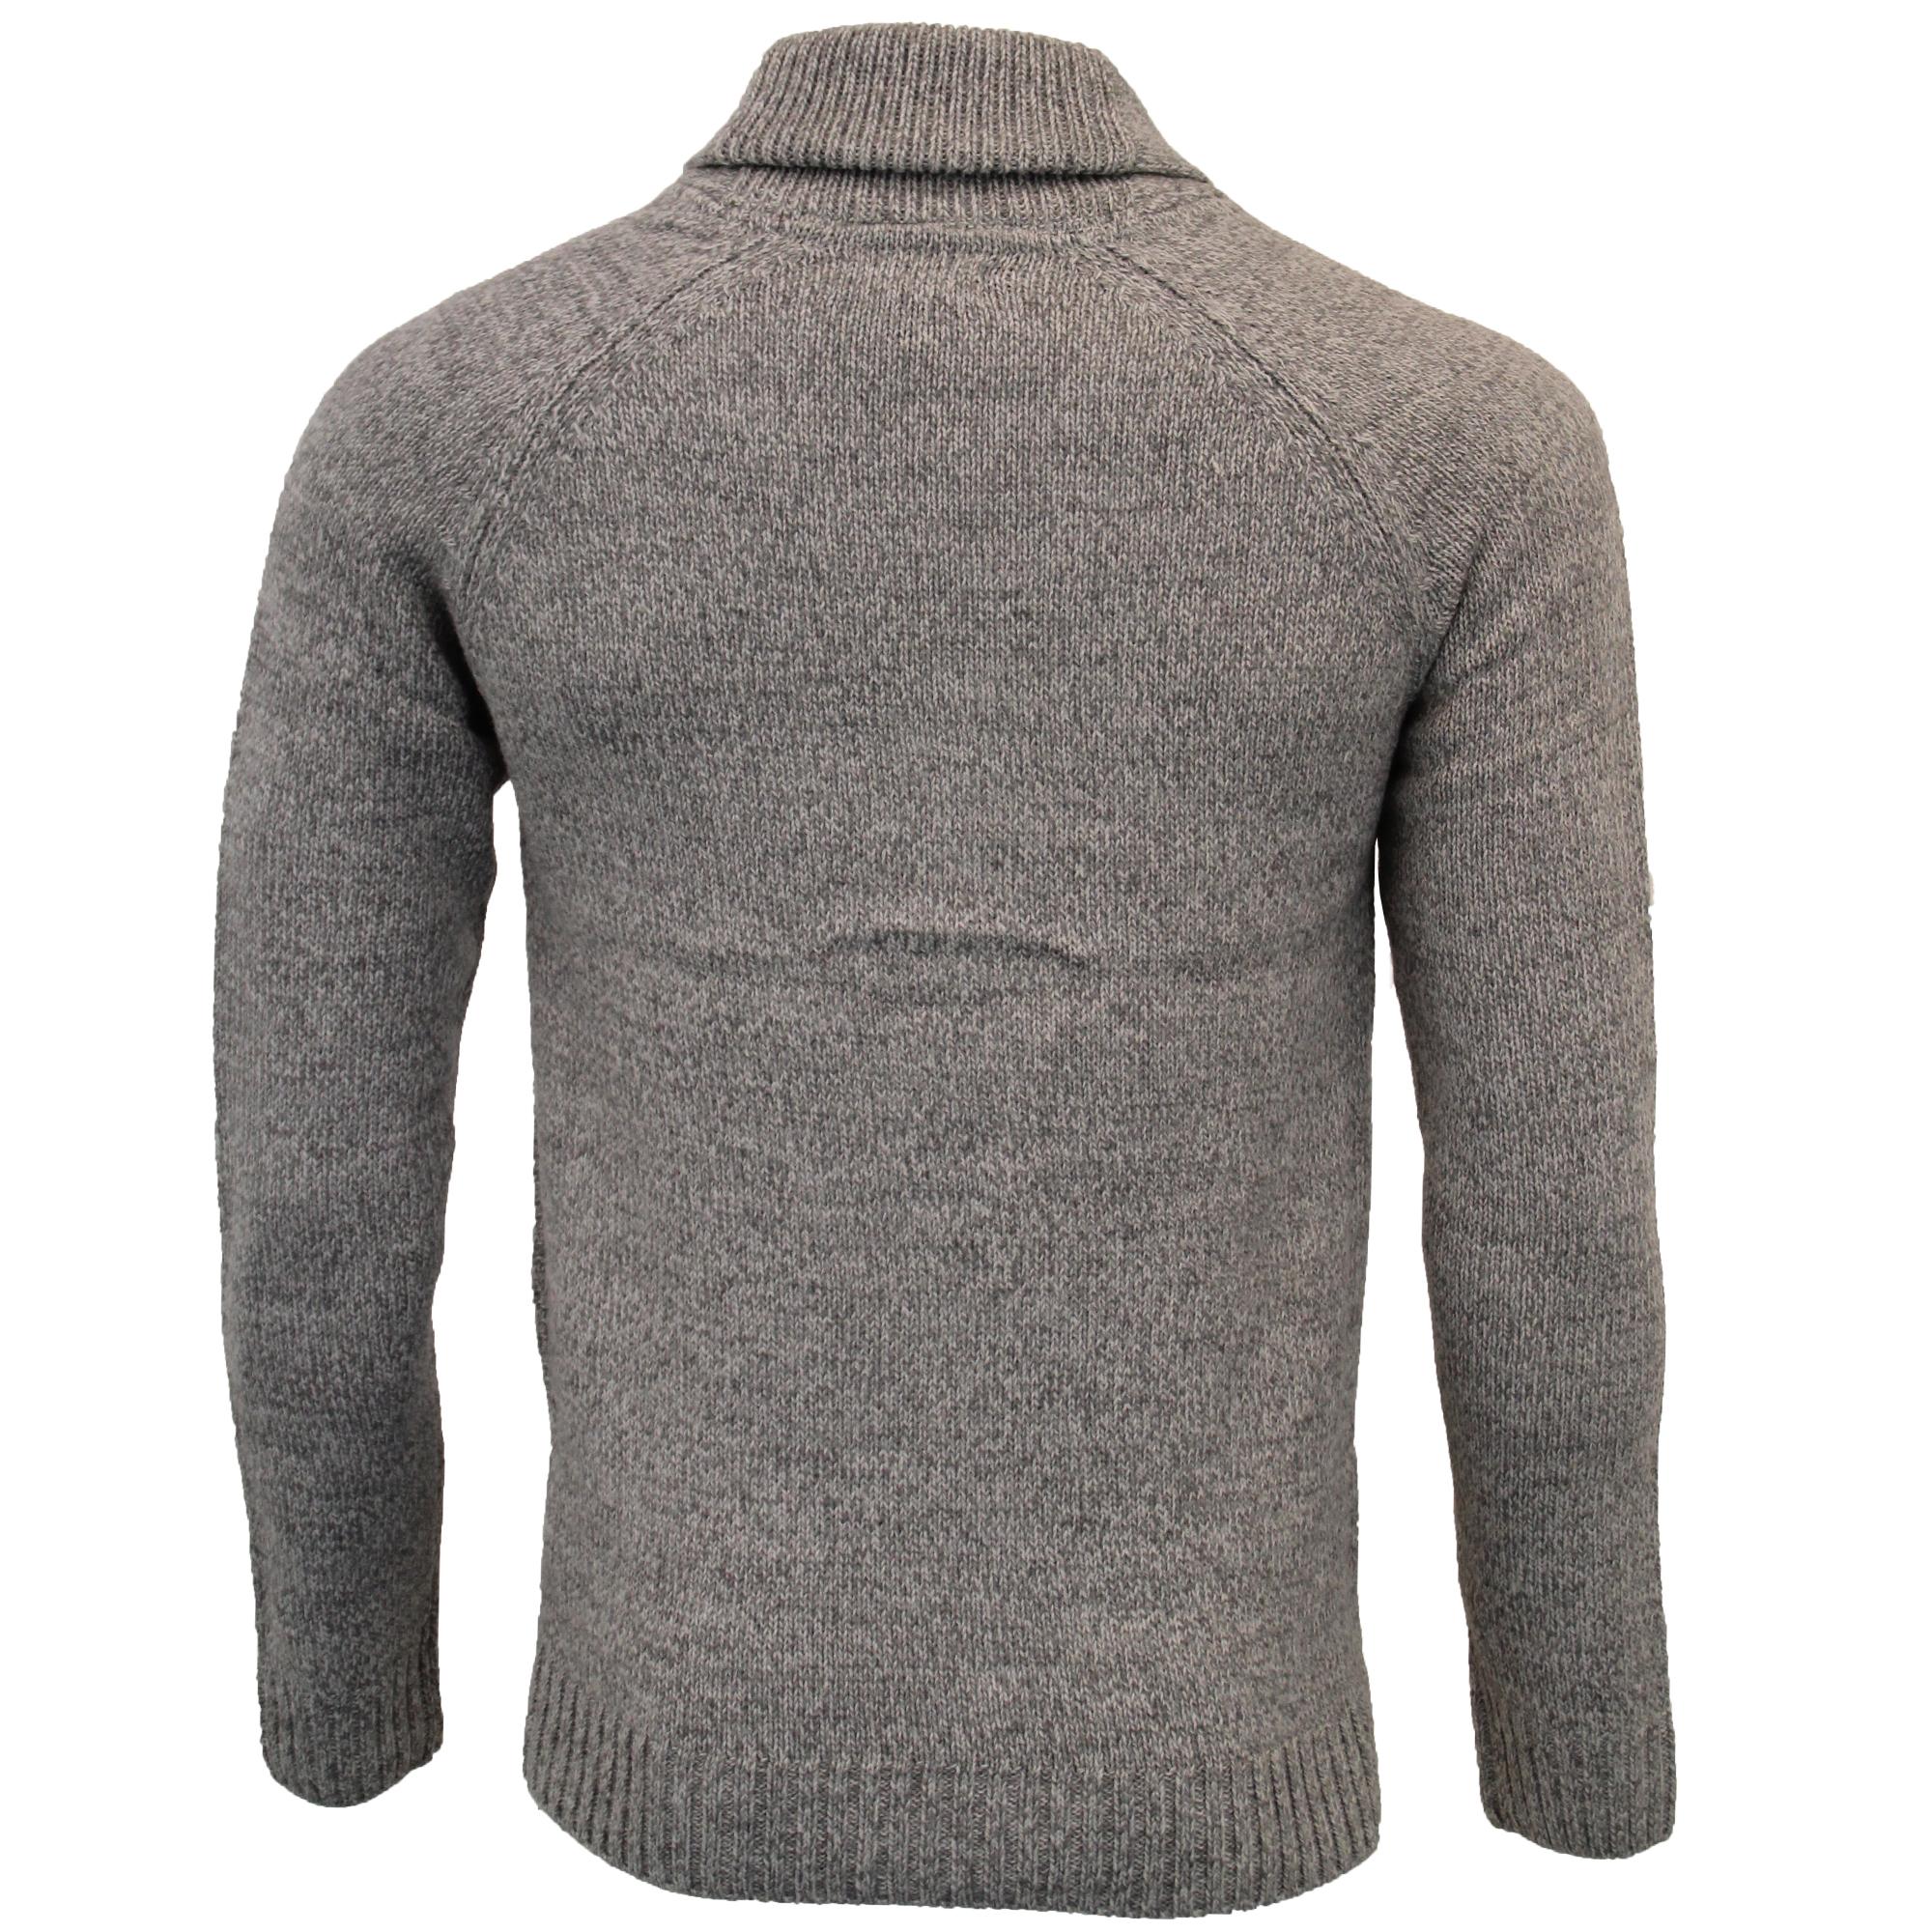 Mens Wool Mix Cardigans Threadbare Knitted Sweater Broken Standard Shawl Winter